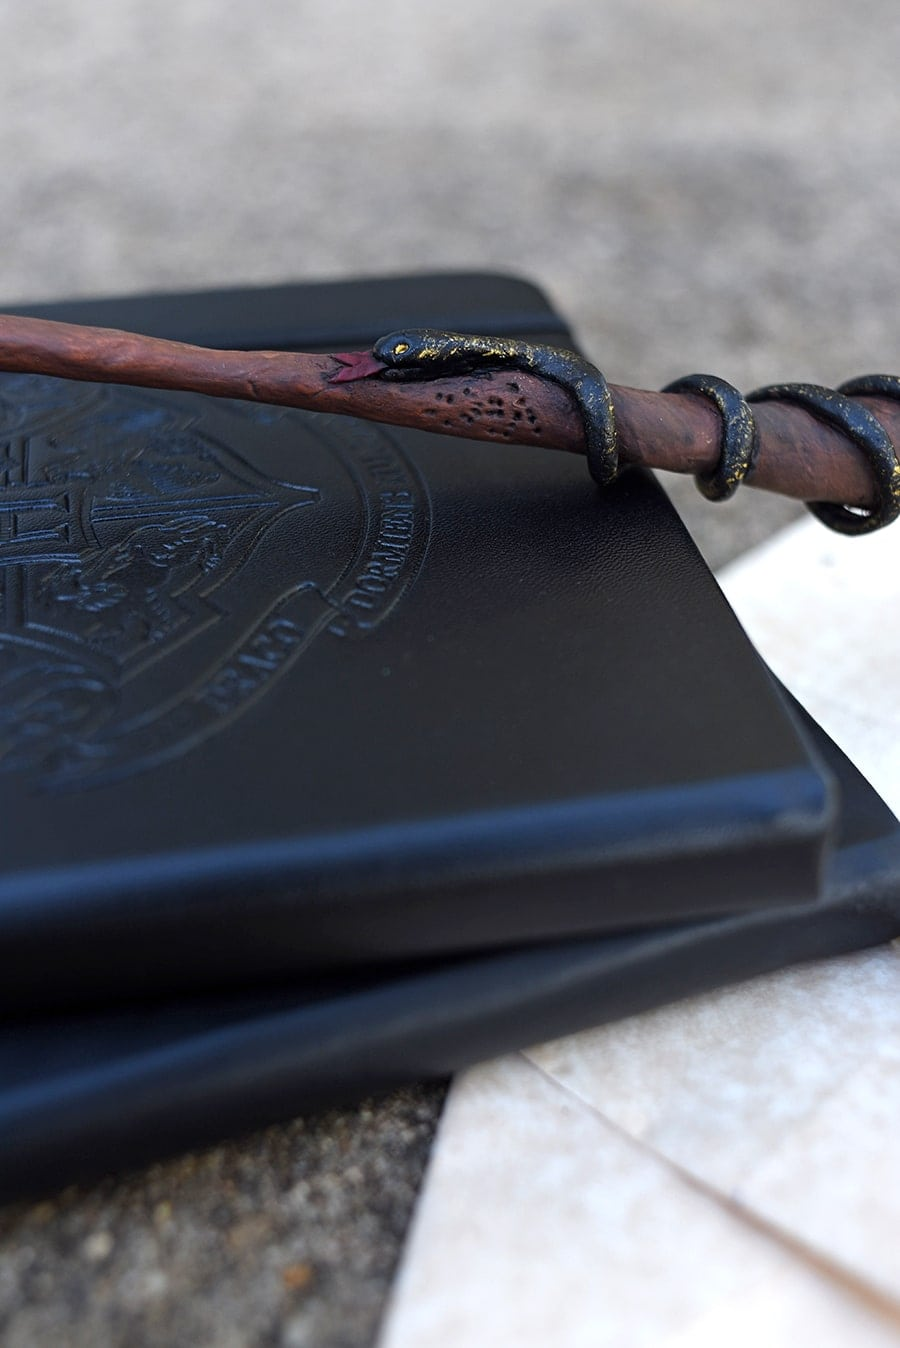 Snake on DIY Harry Potter wand prop